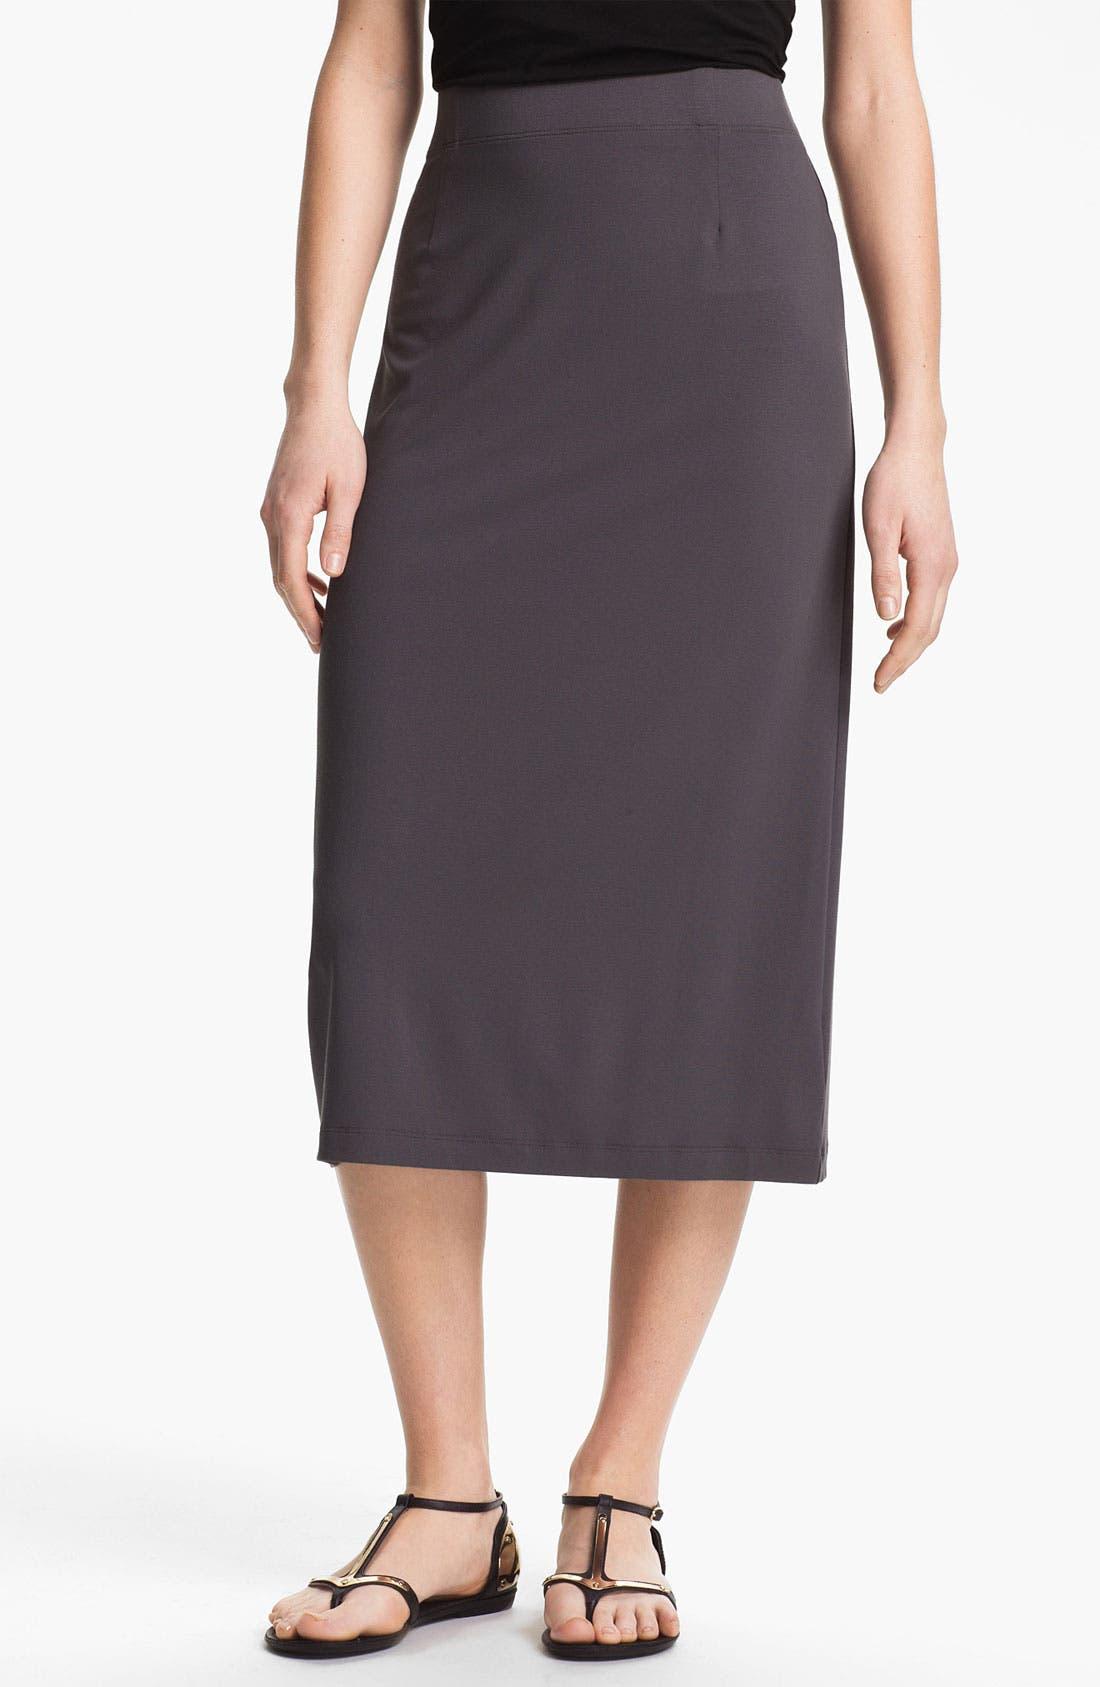 Alternate Image 1 Selected - Eileen Fisher Pull On Pencil Skirt